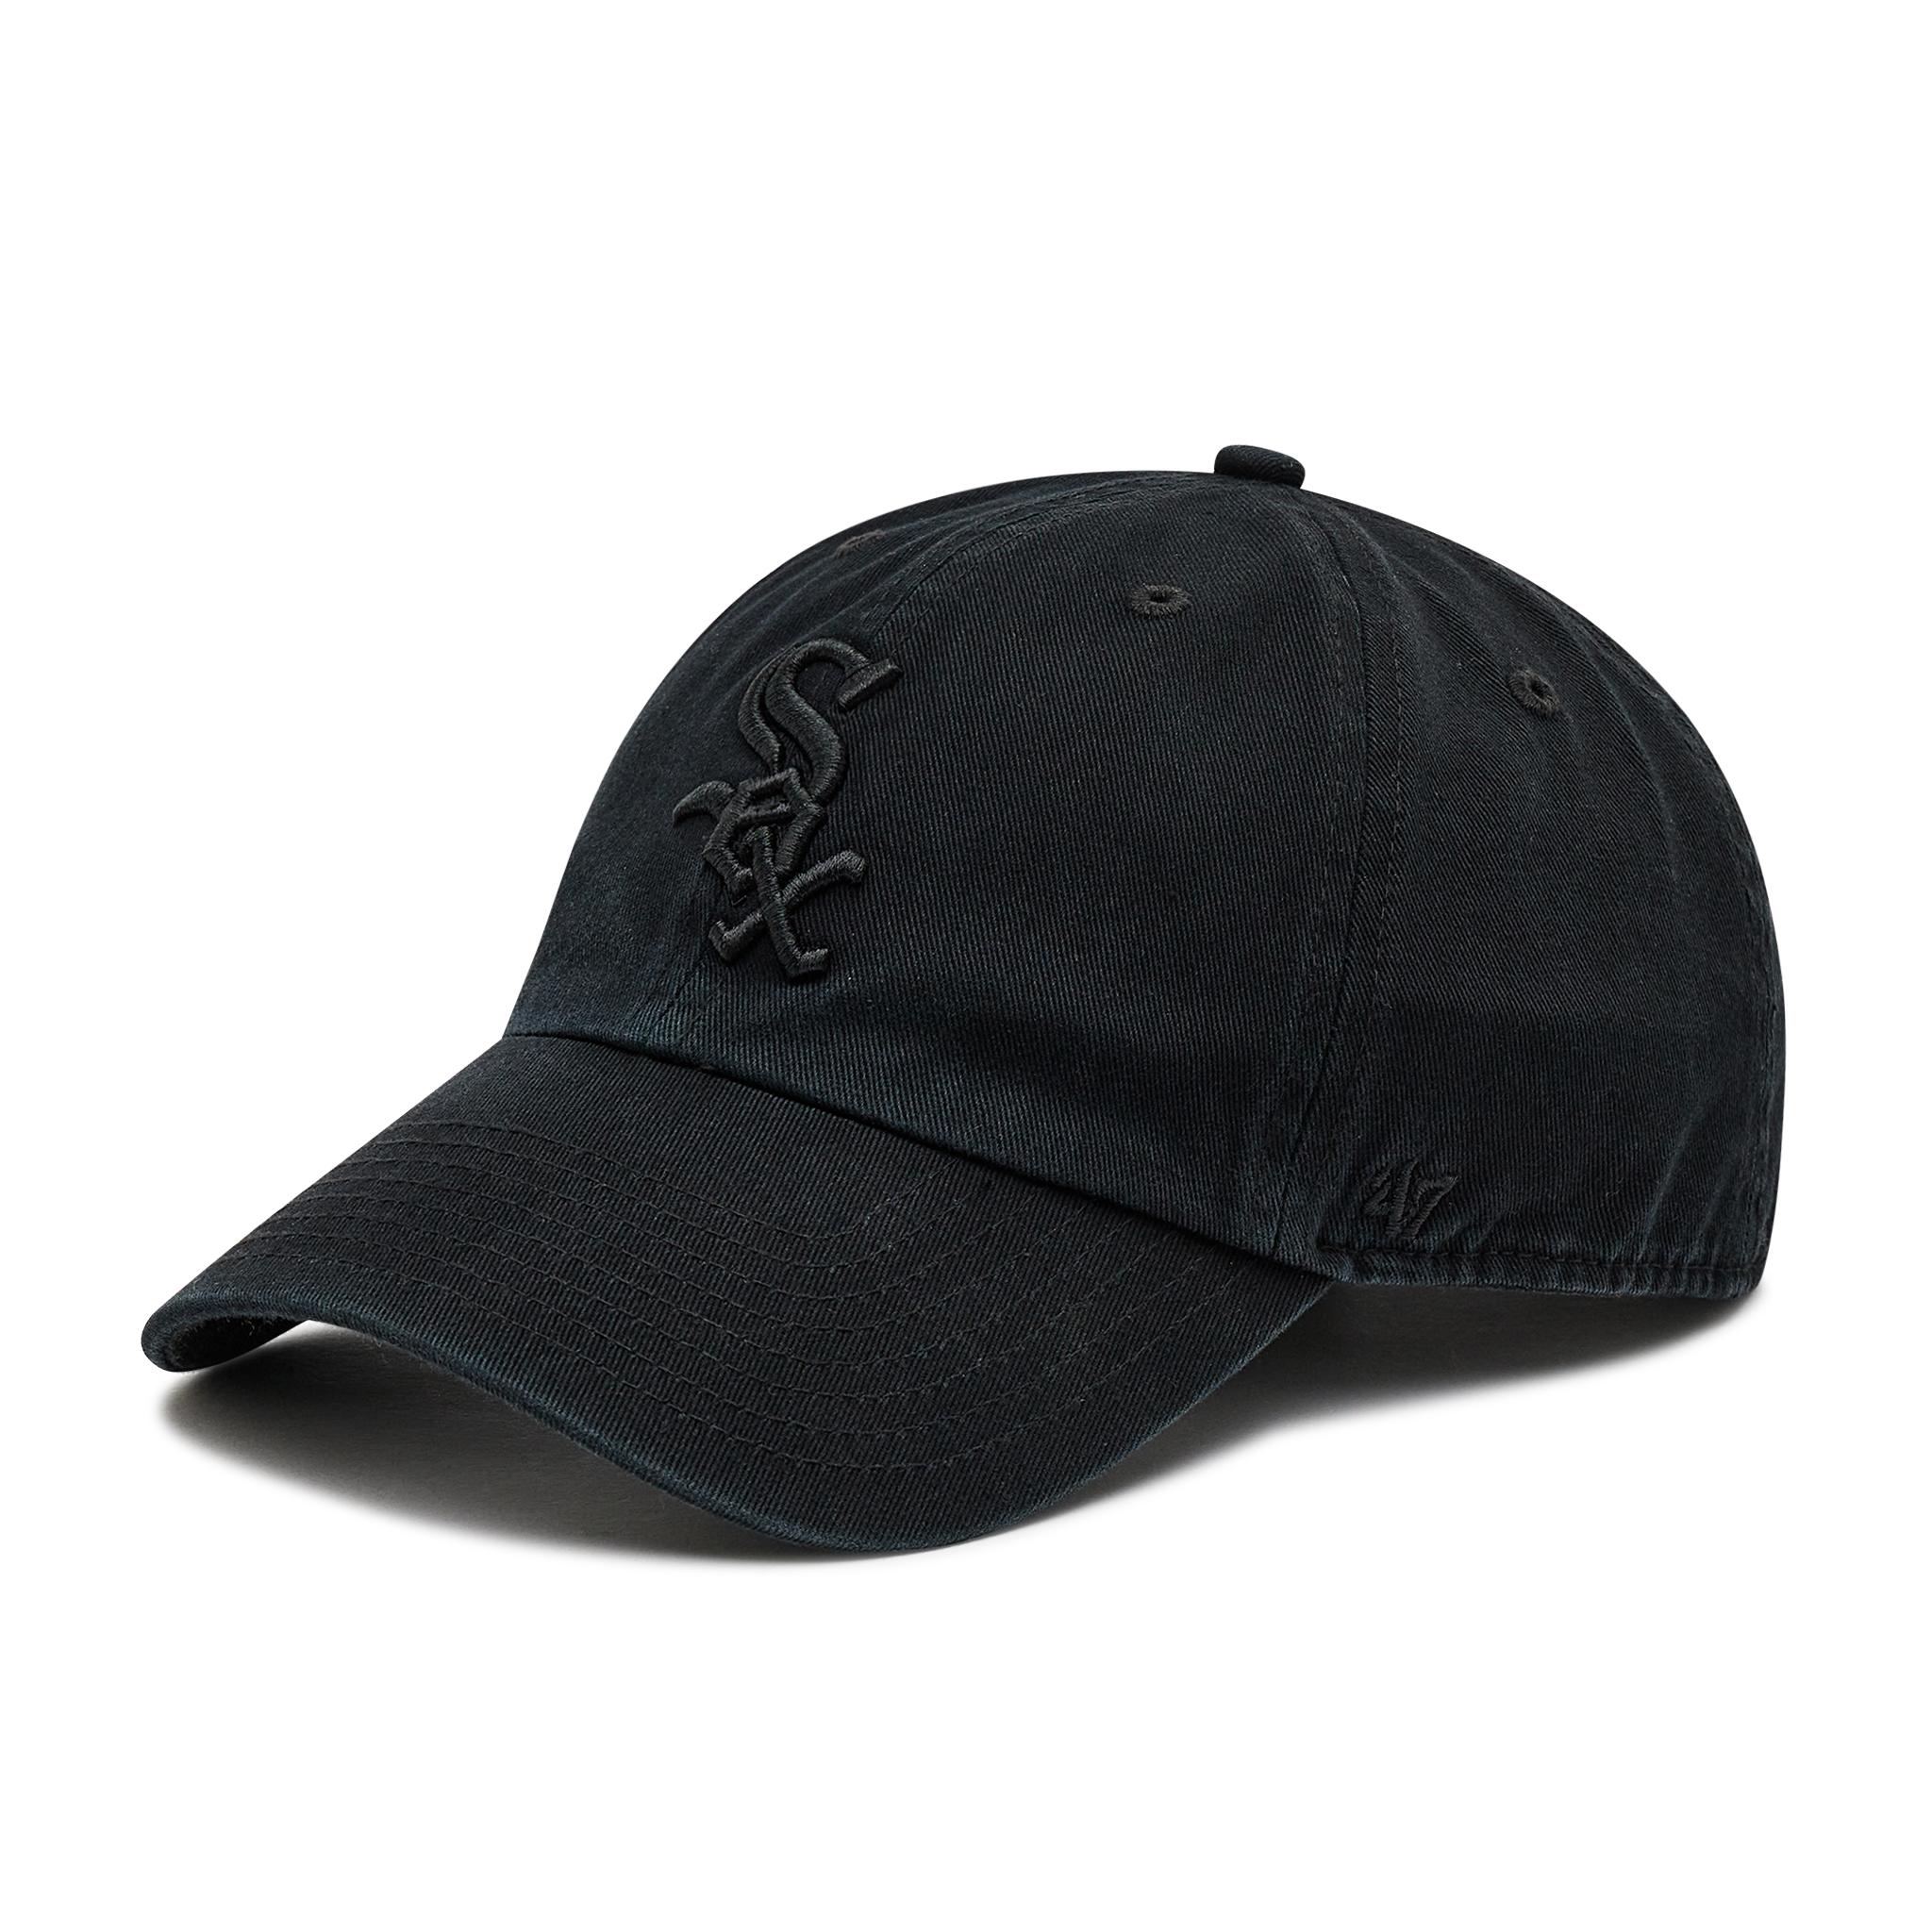 Image of Cap 47 BRAND - Chicago White Sox Clean UP B-RGW06GWSNL-BKB Black